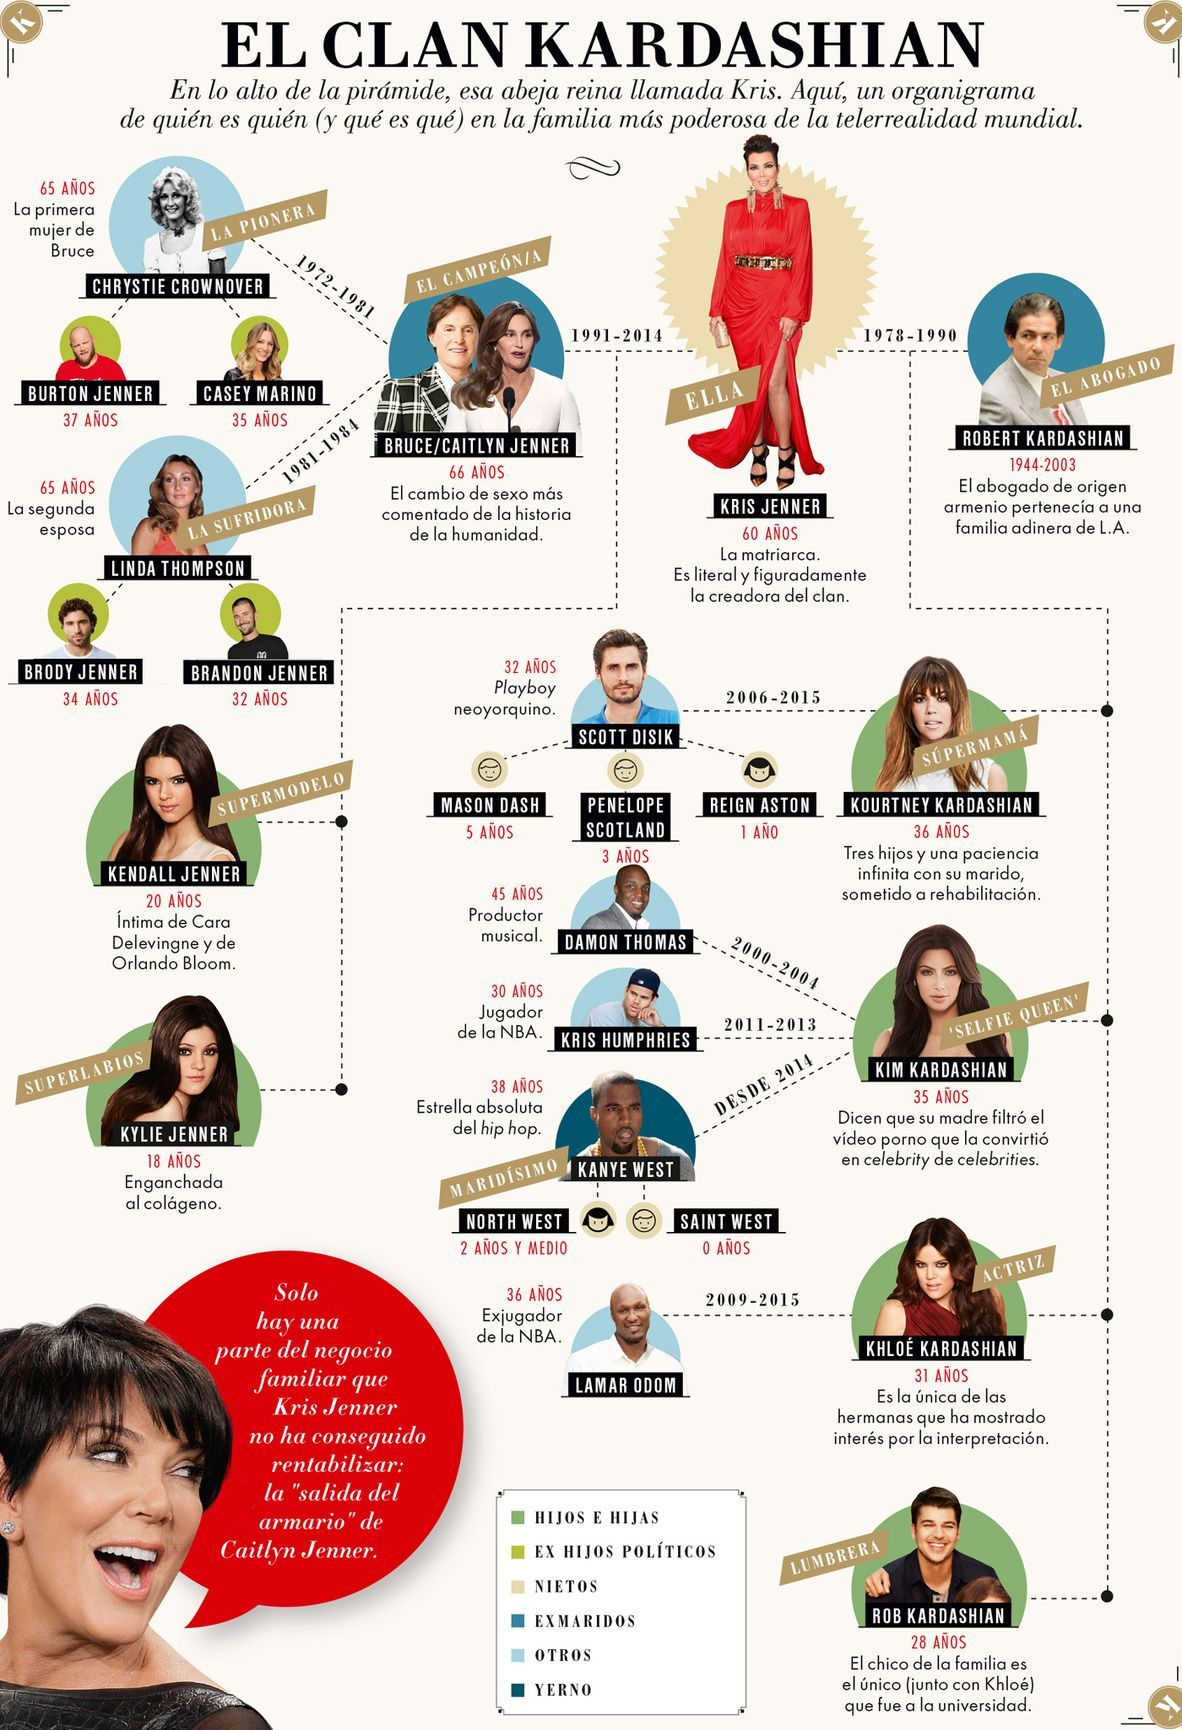 Árbol genealógico del clan Kardashian